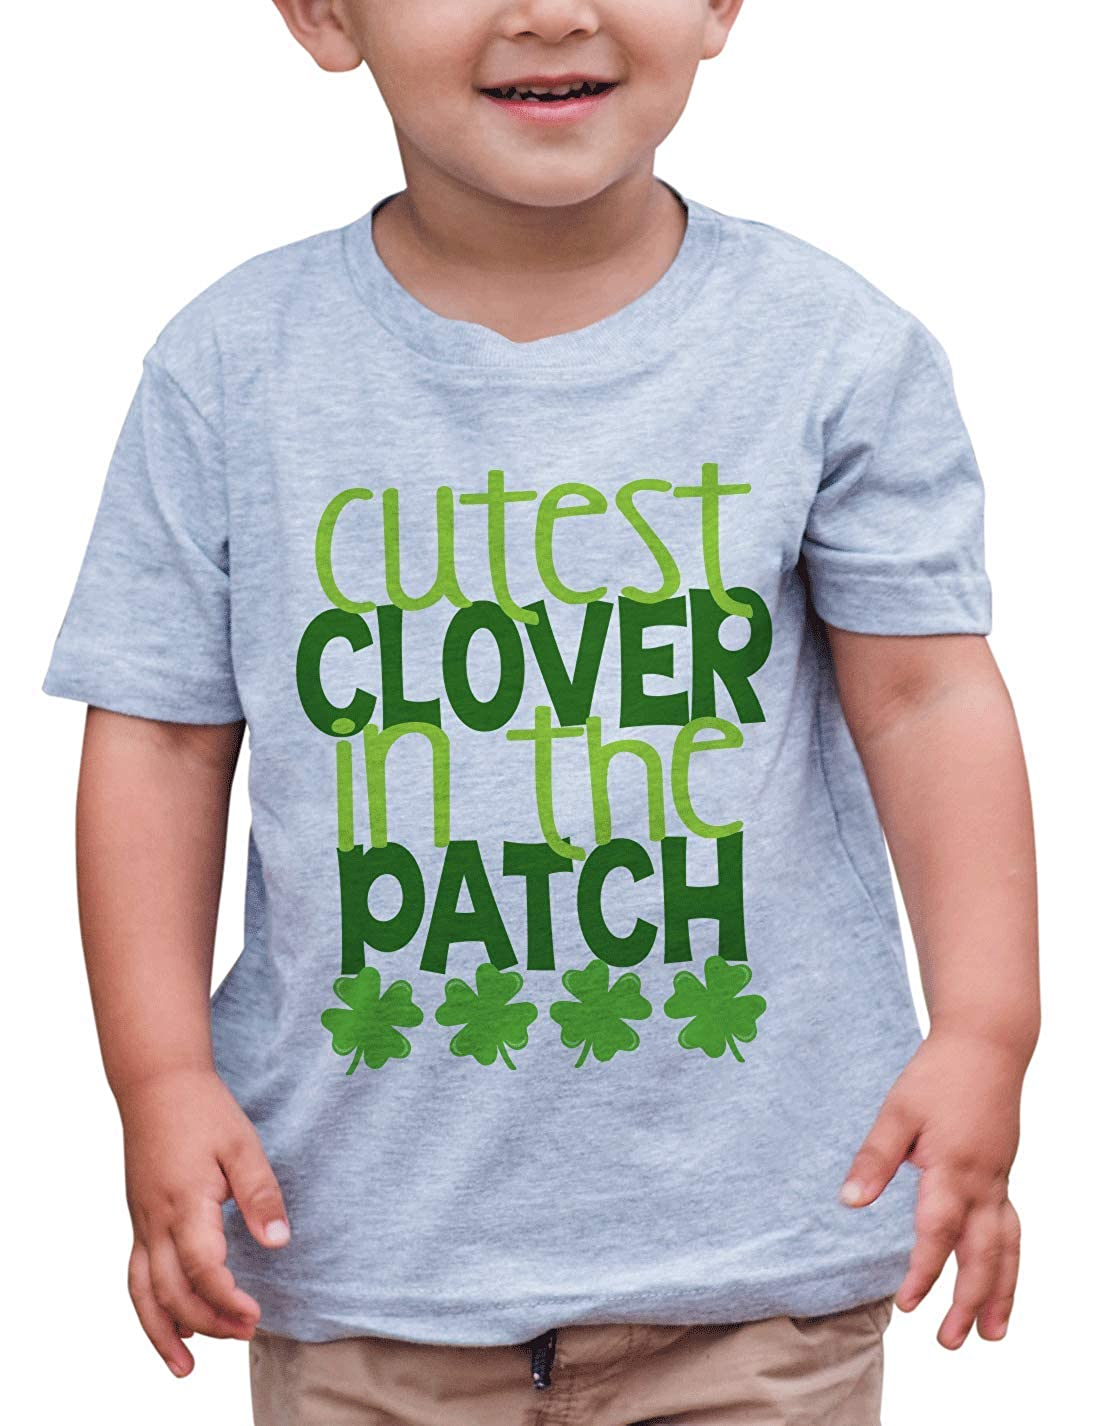 Patricks Day T-Shirt 7 ate 9 Apparel Kids Cutest Clover St